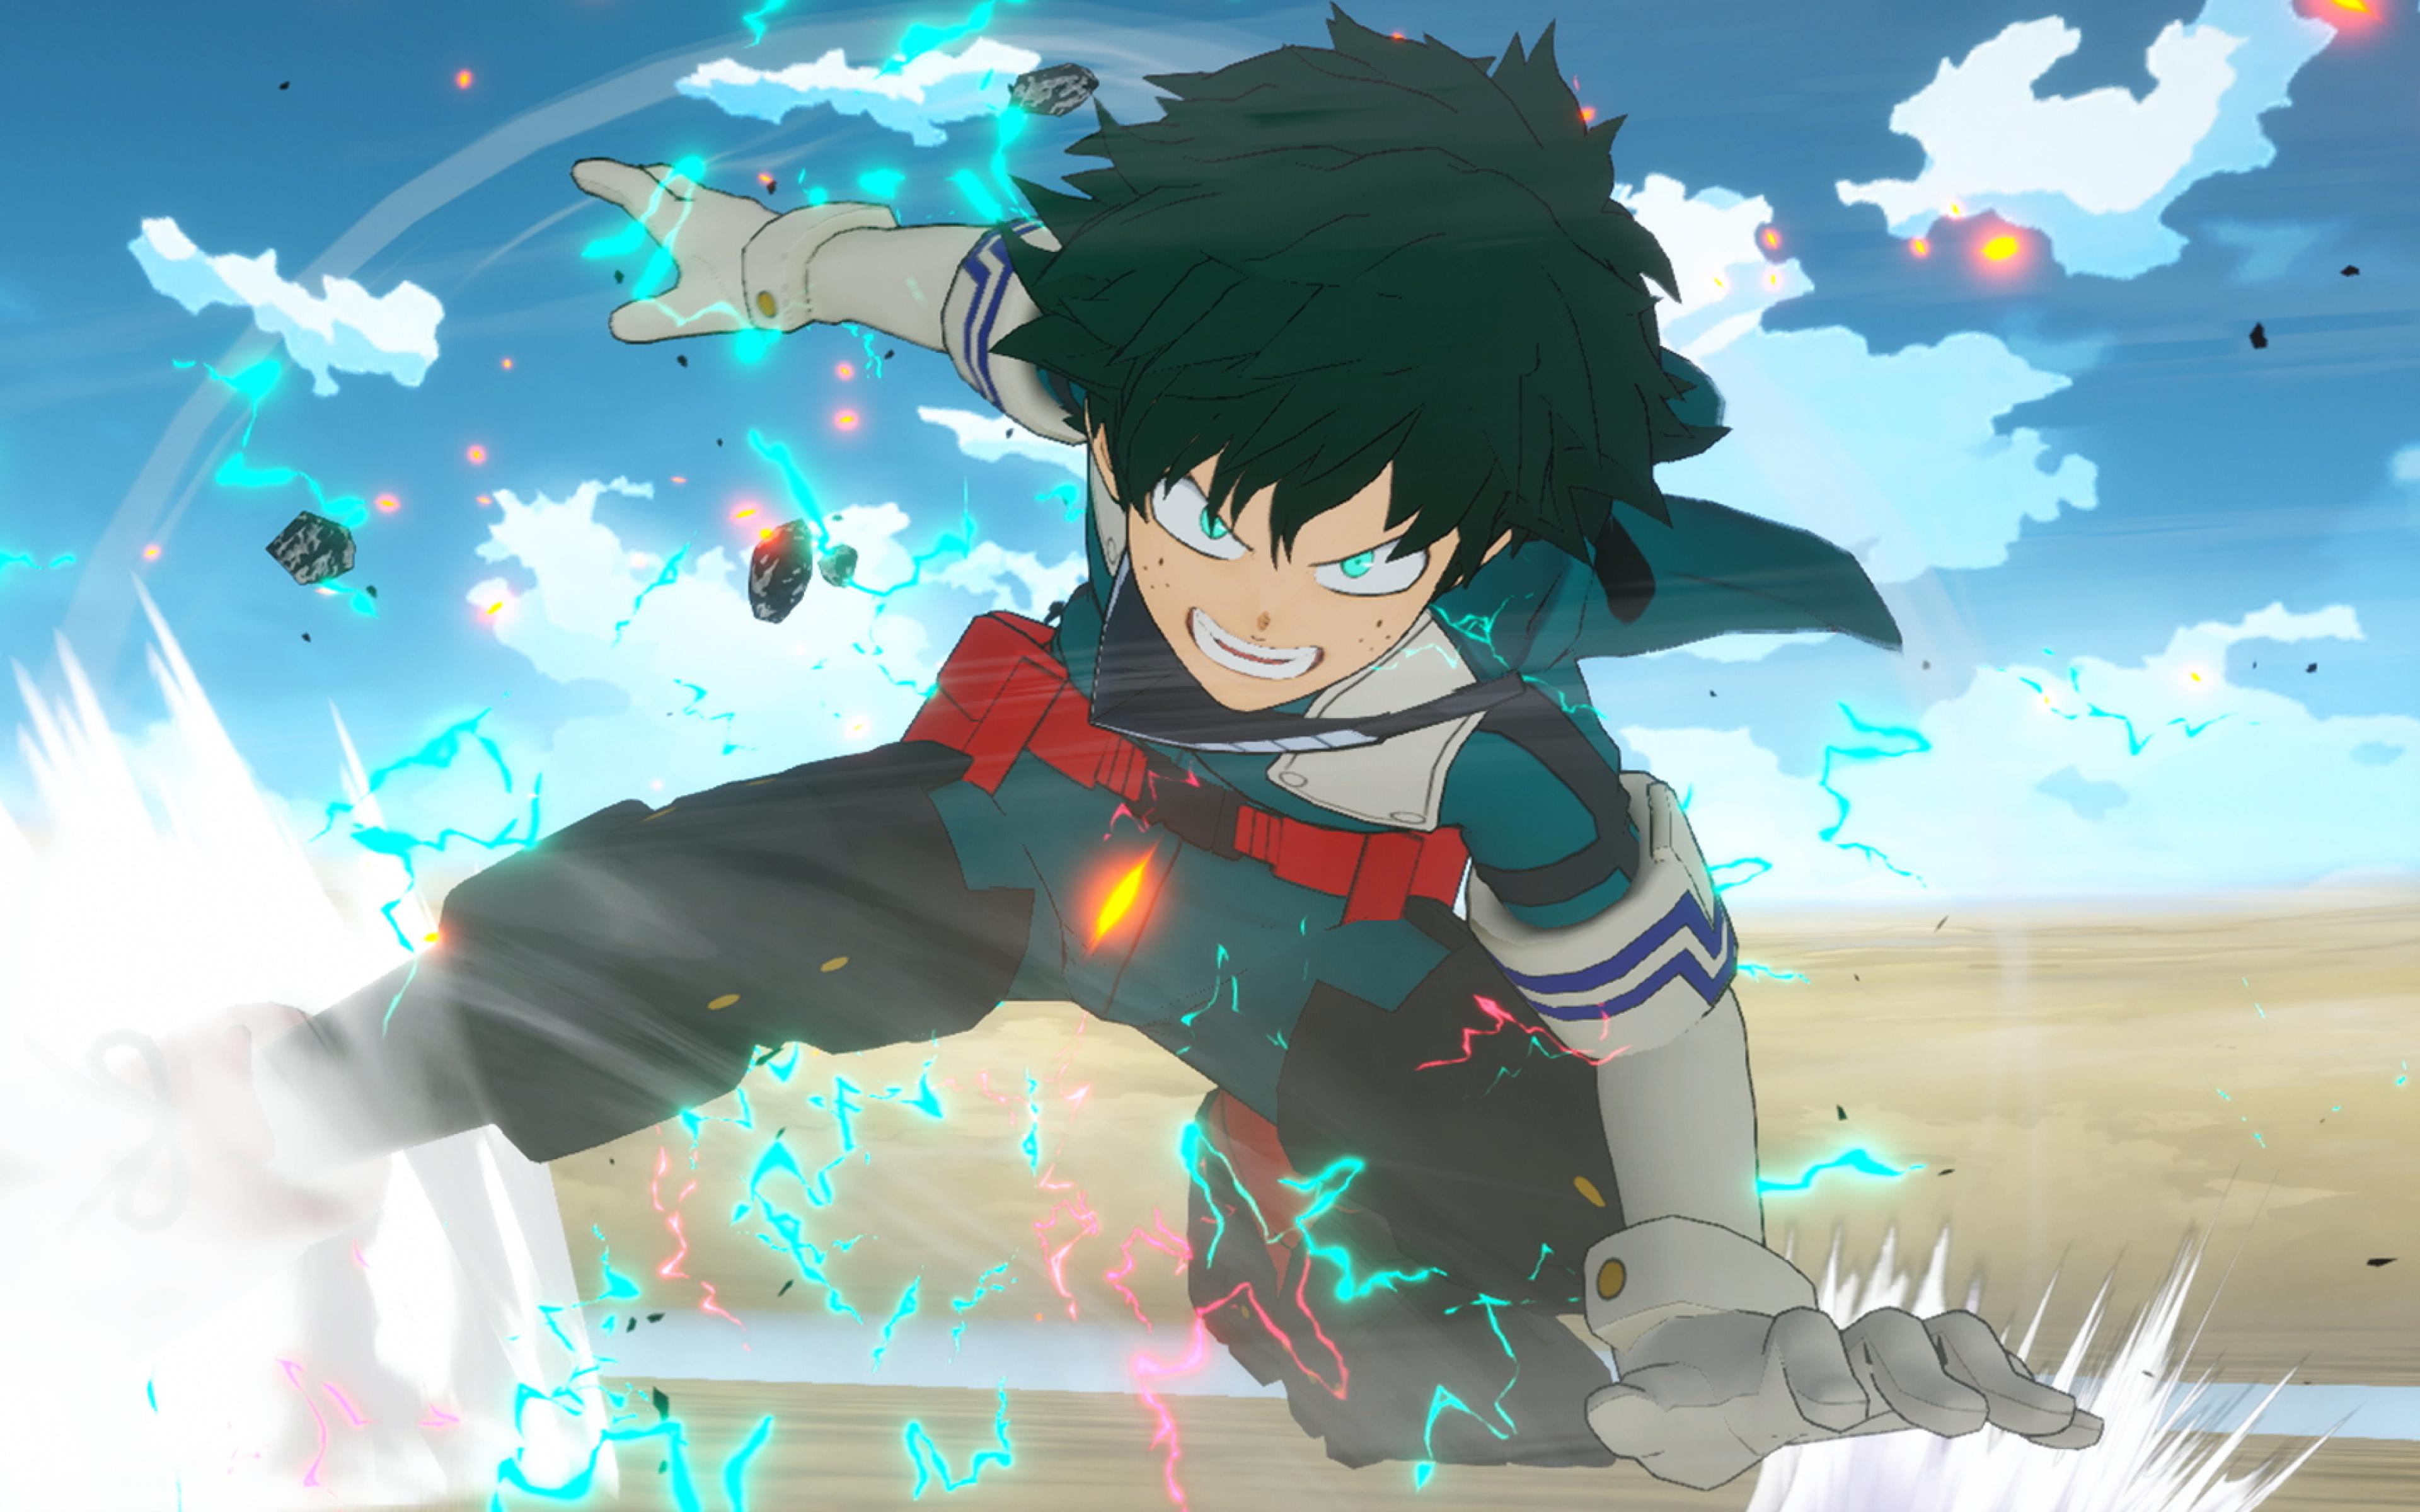 3840x2400 Izuku Midoriya Anime 4k 3840x2400 Resolution